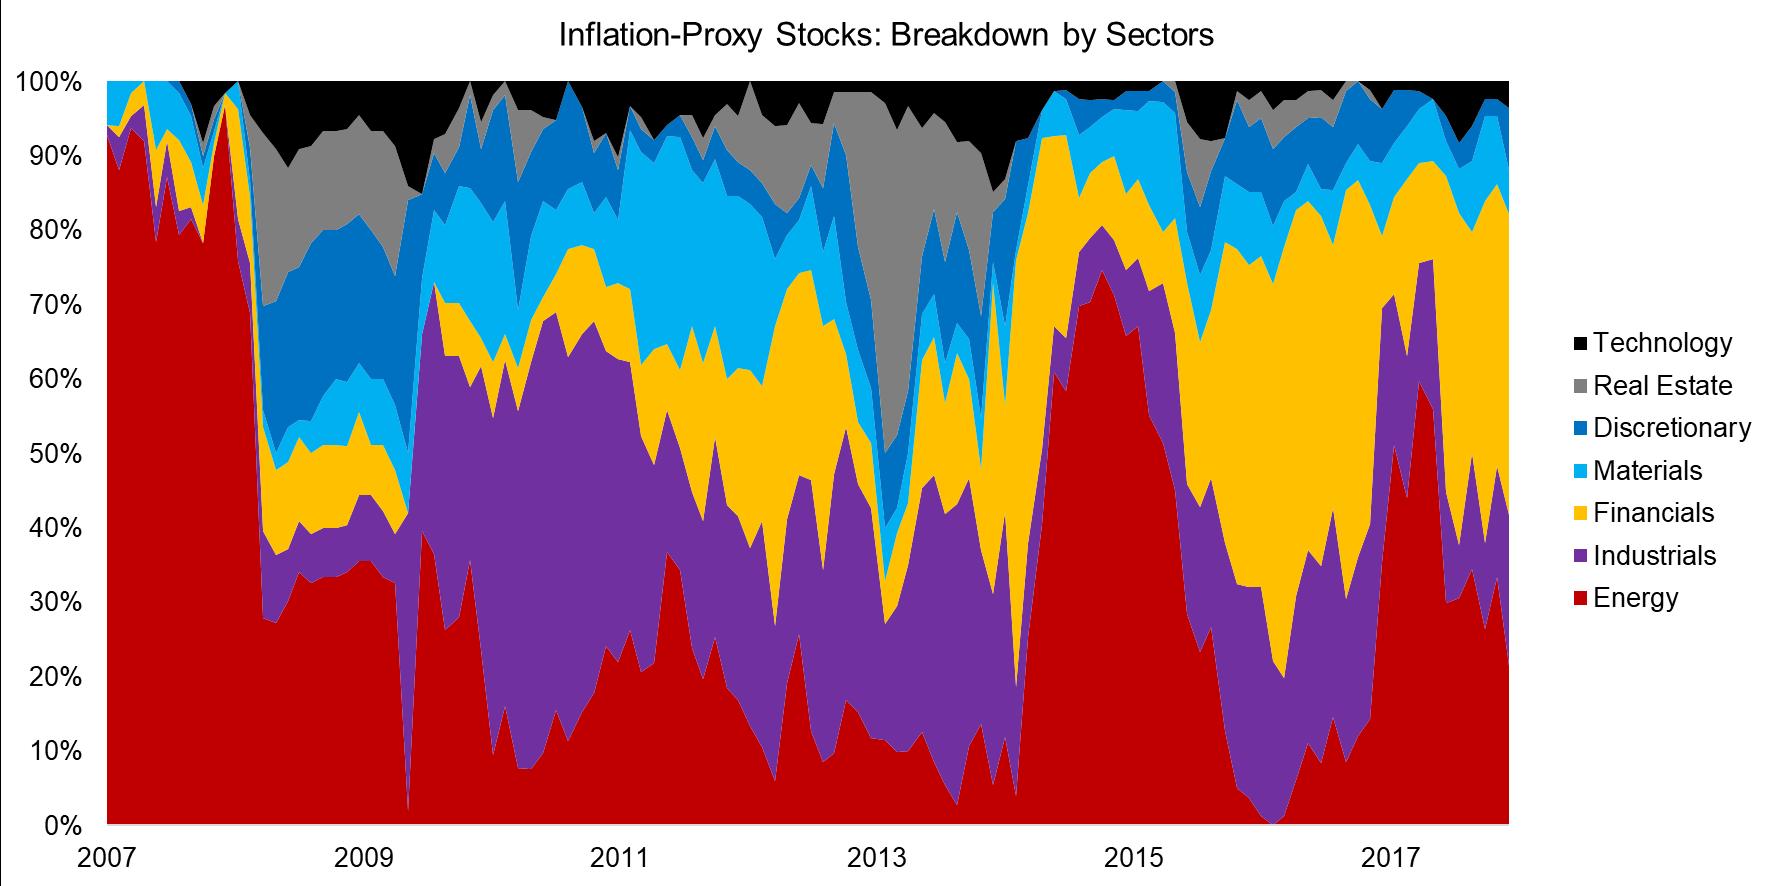 Inflation-Proxy Stocks Breakdown by Sectors